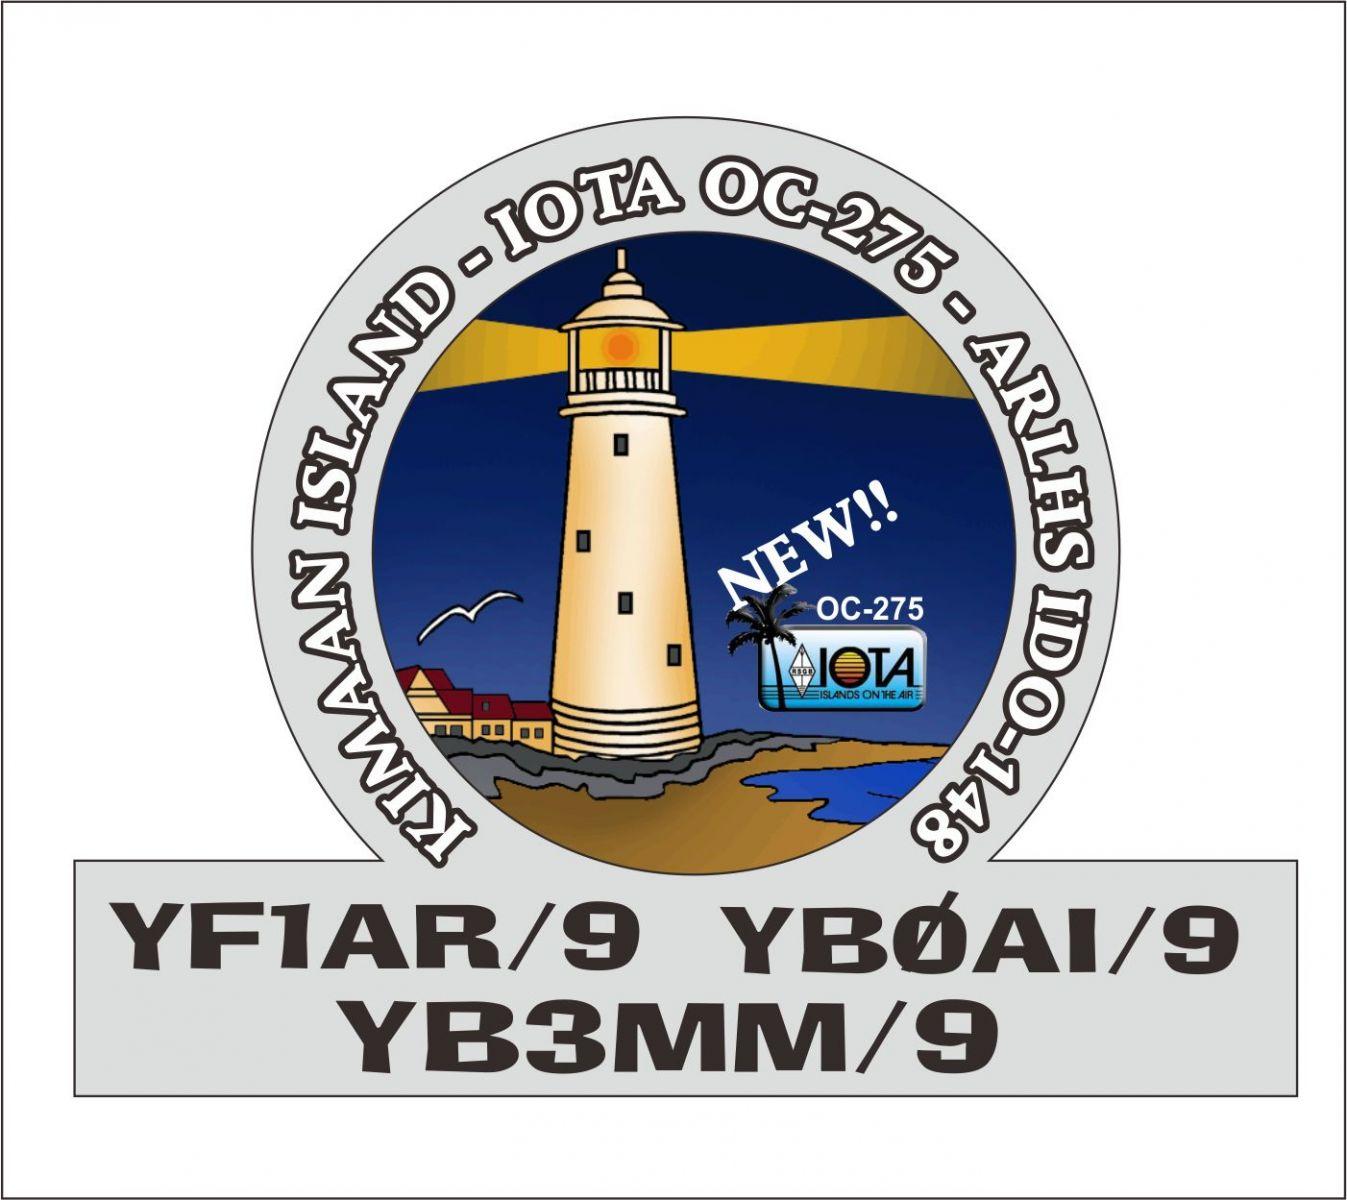 Остров Кимаан YF1AR/9 YB0AI/9 YB3MM/9